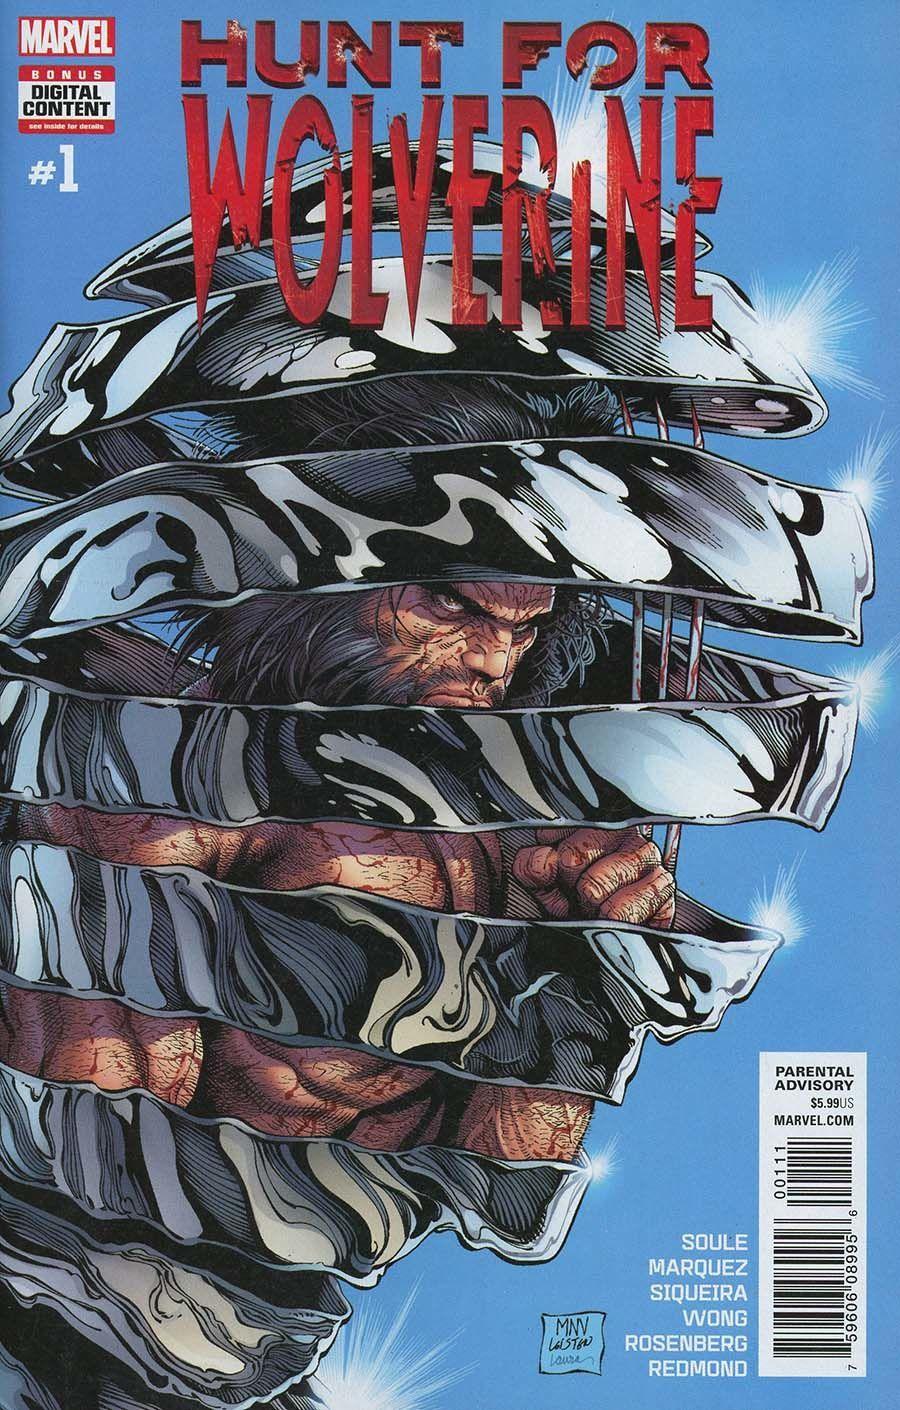 Hunt for Wolverine #1 (Writer Charles Soule, Cover Art by Steve McNiven)